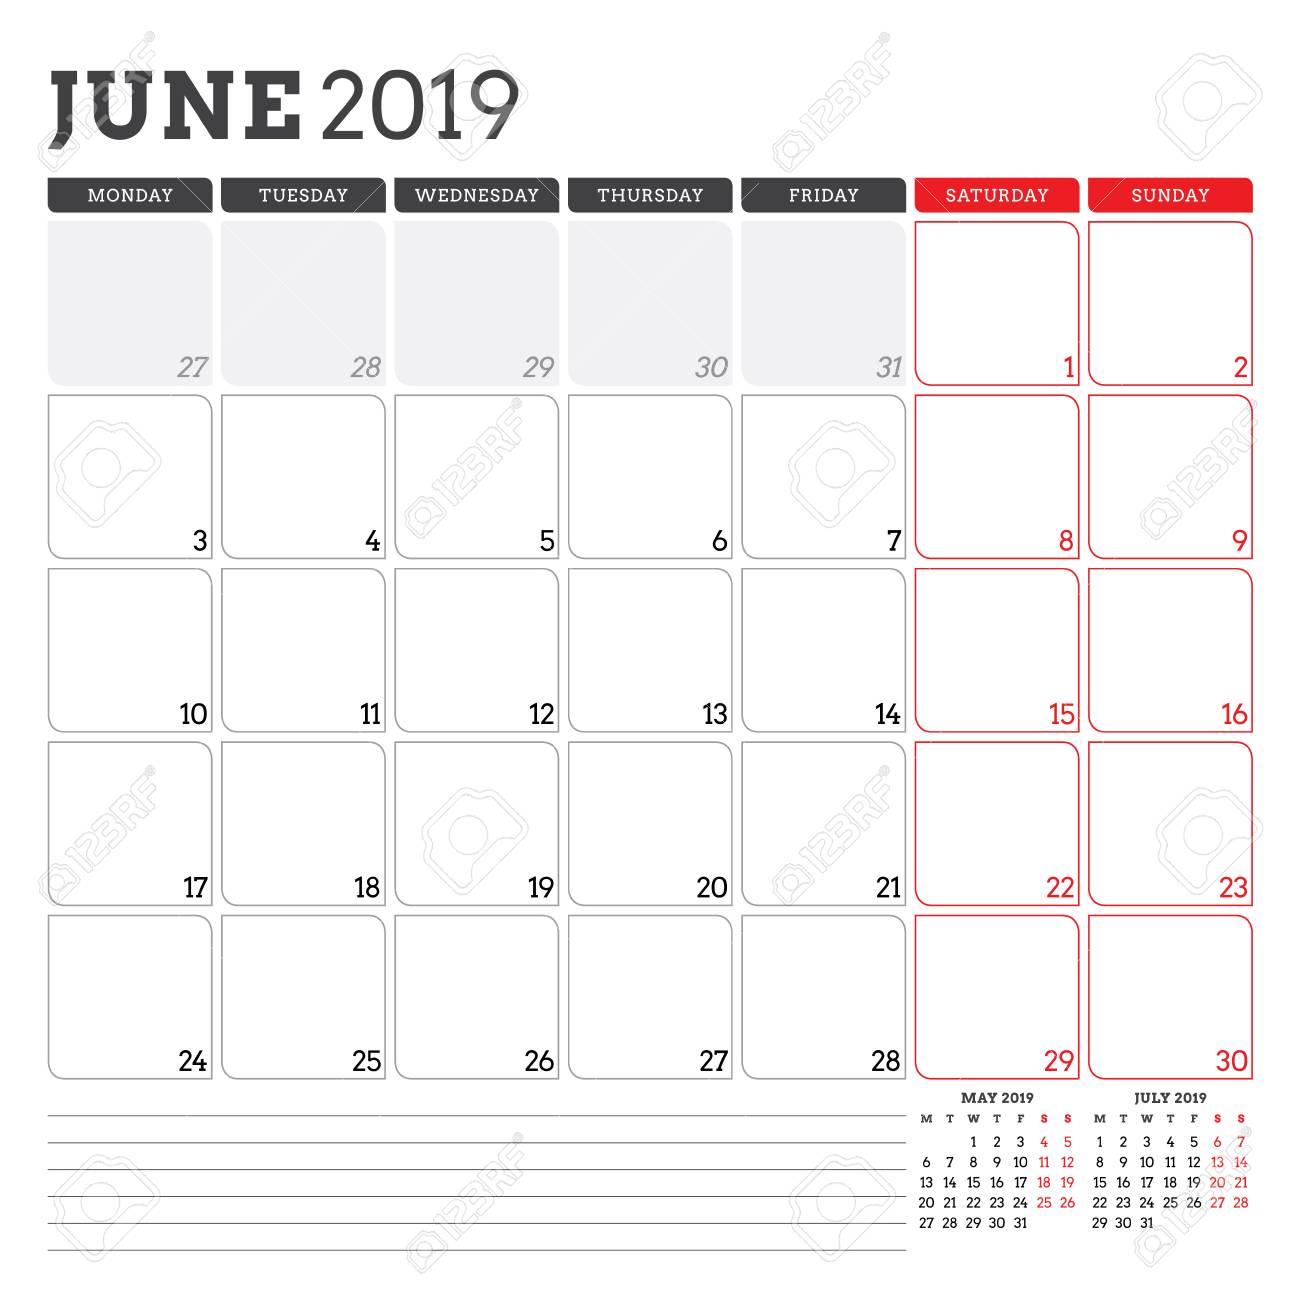 picture regarding June Calendar Printable identified as Calendar planner for June 2019. 7 days starts off upon Monday. Printable..